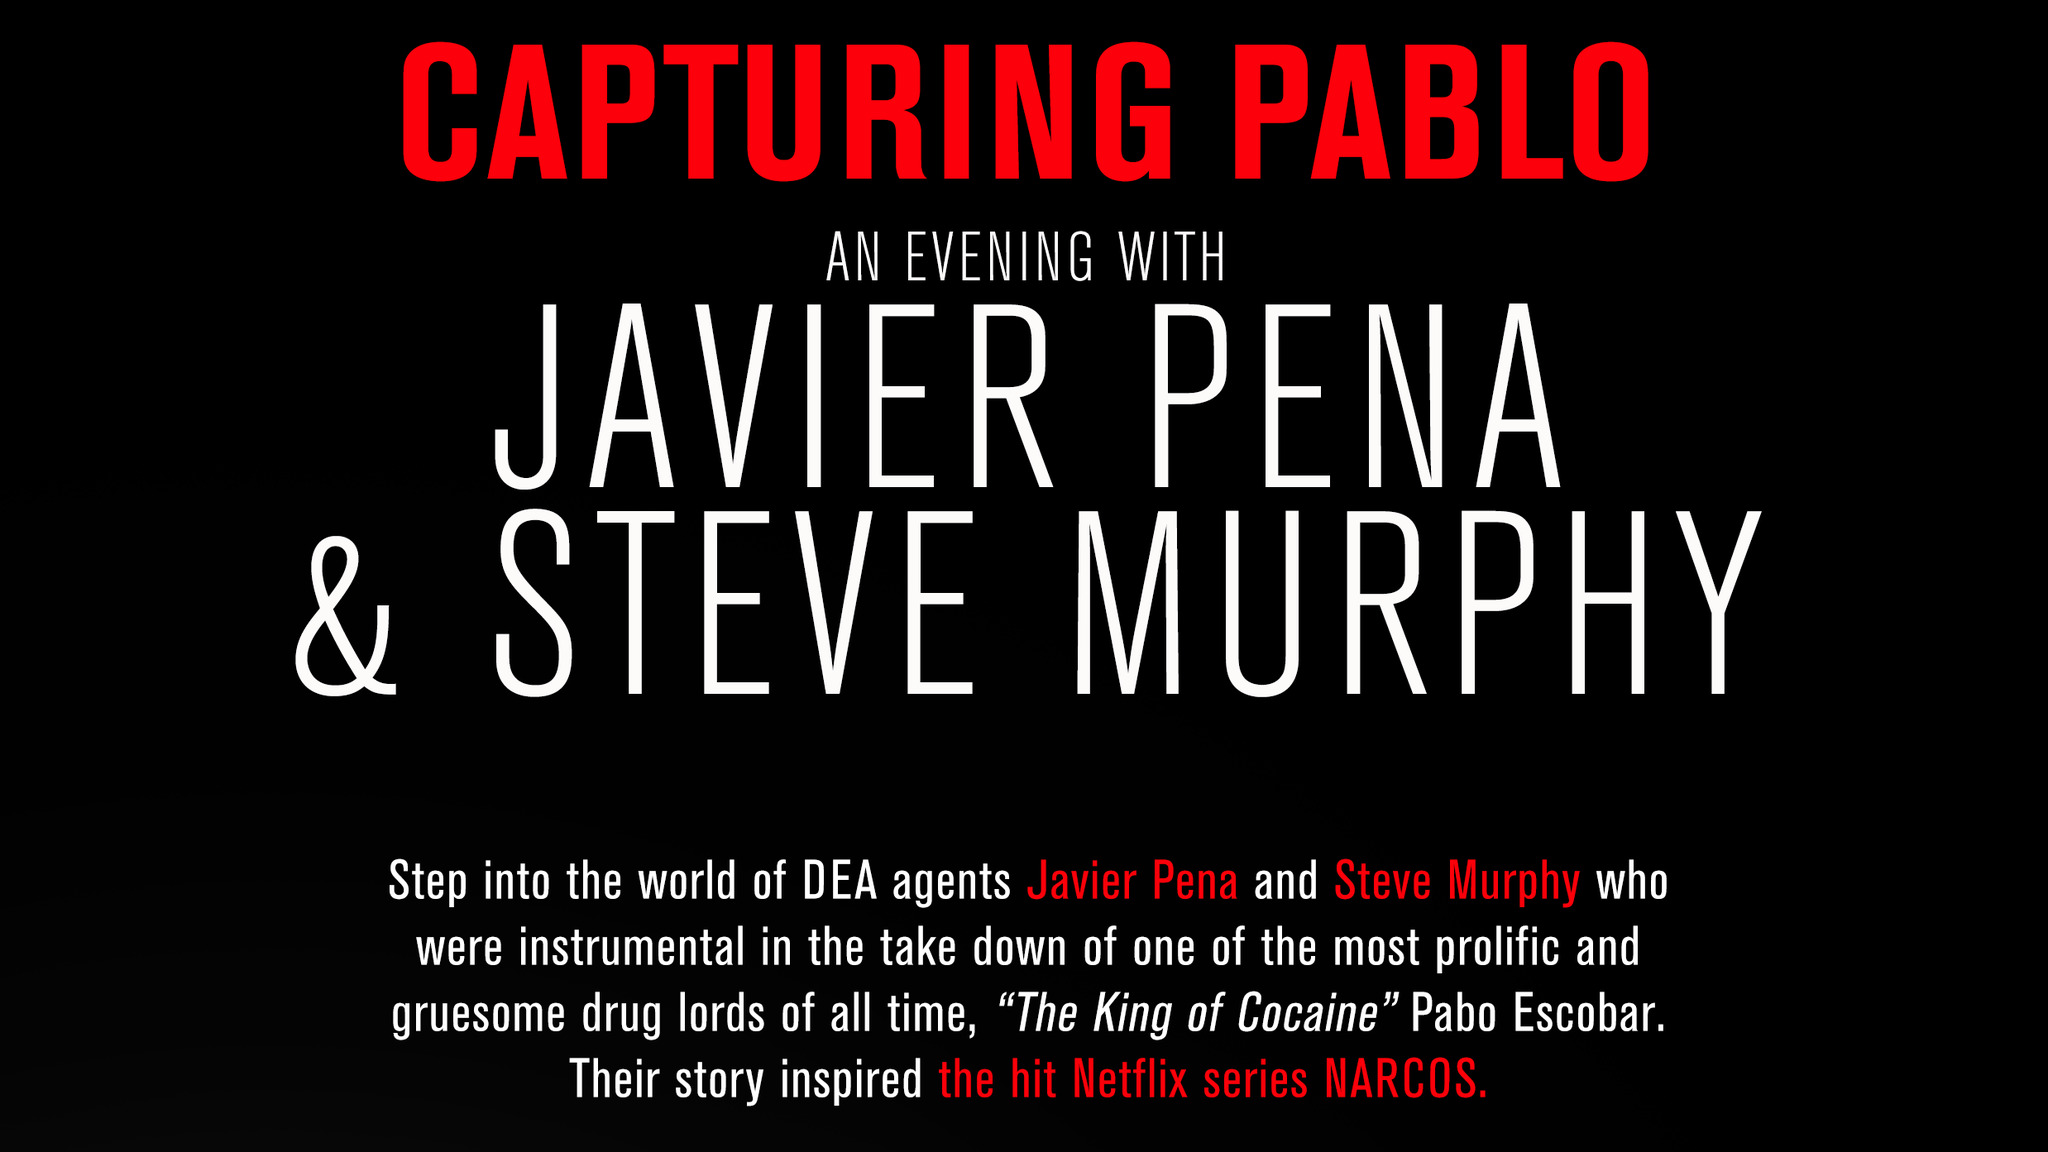 Capturing Pablo World Tour